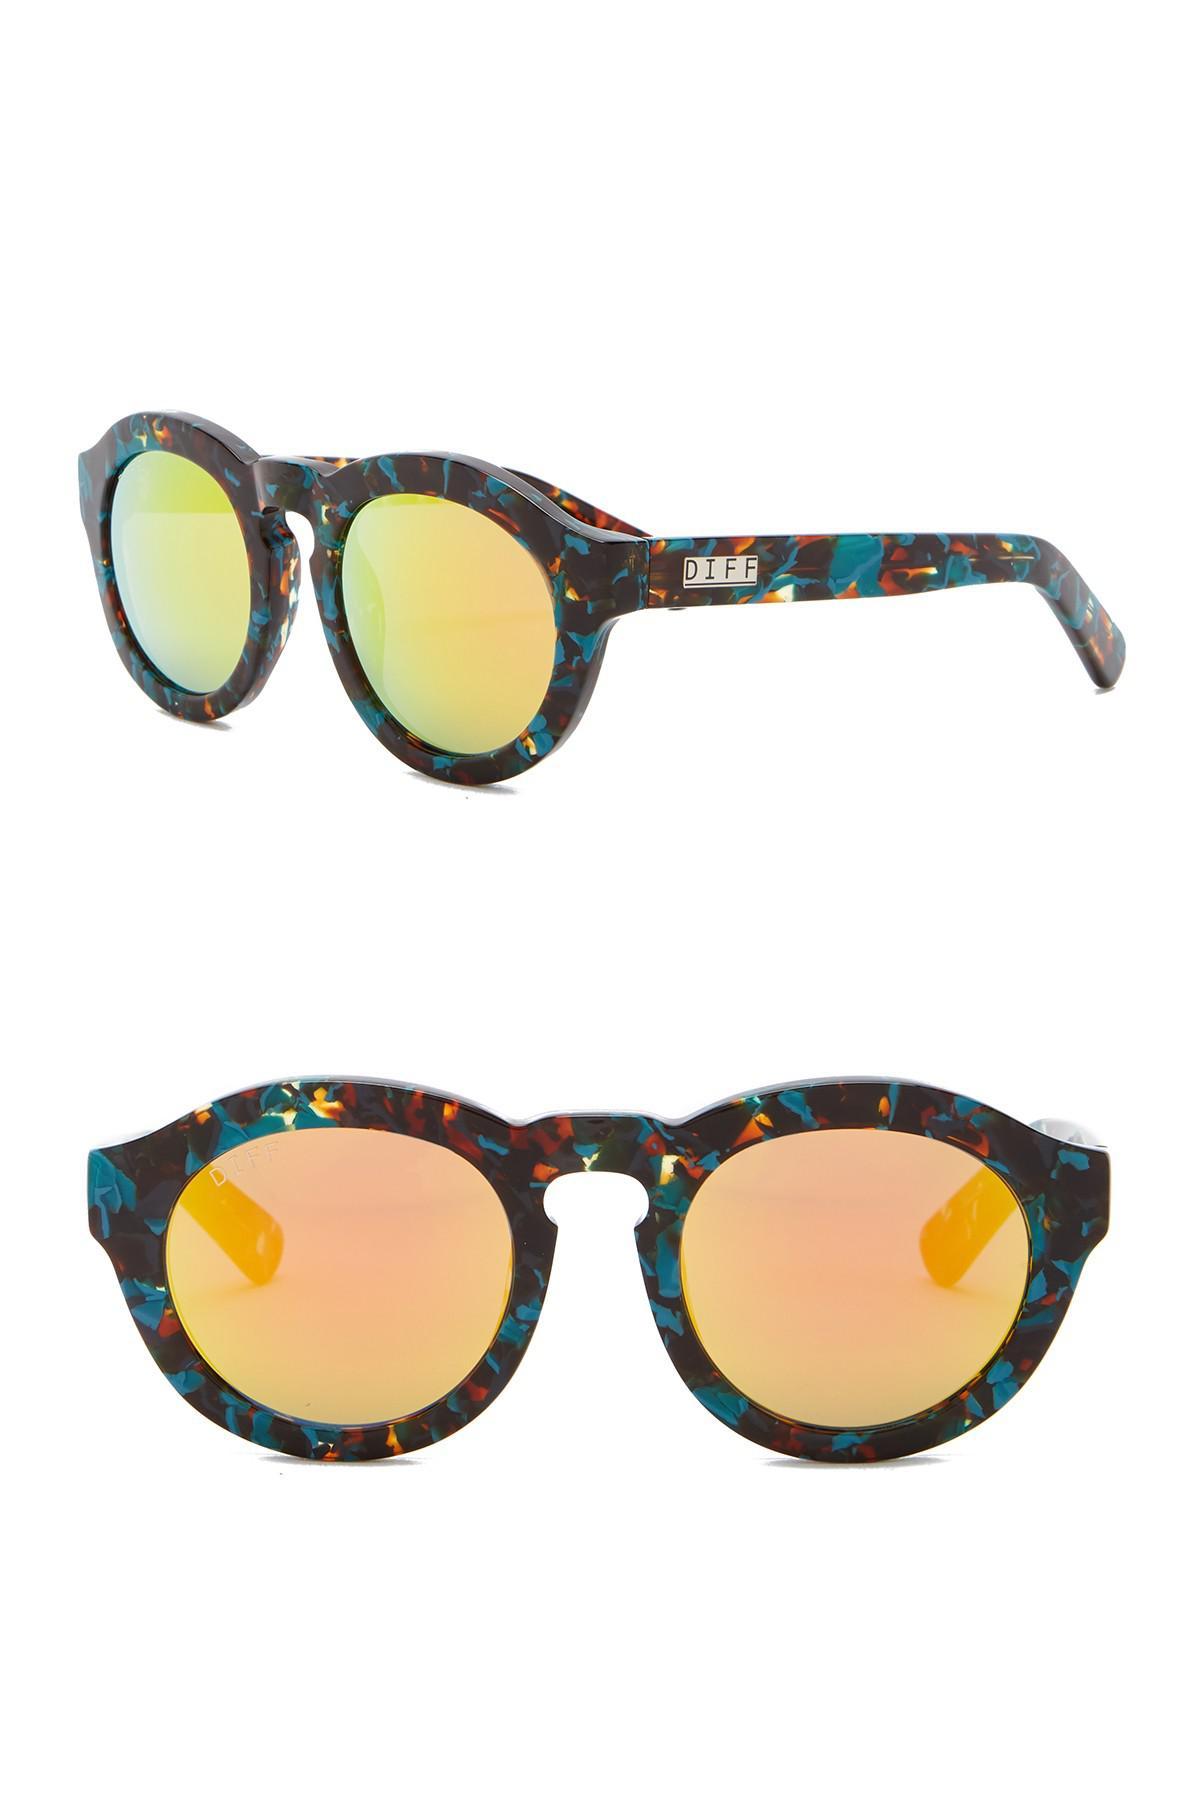 99ac99f24c5 Lyst - DIFF Dime Round Keyhole Bridge 48mm Acetate Sunglasses